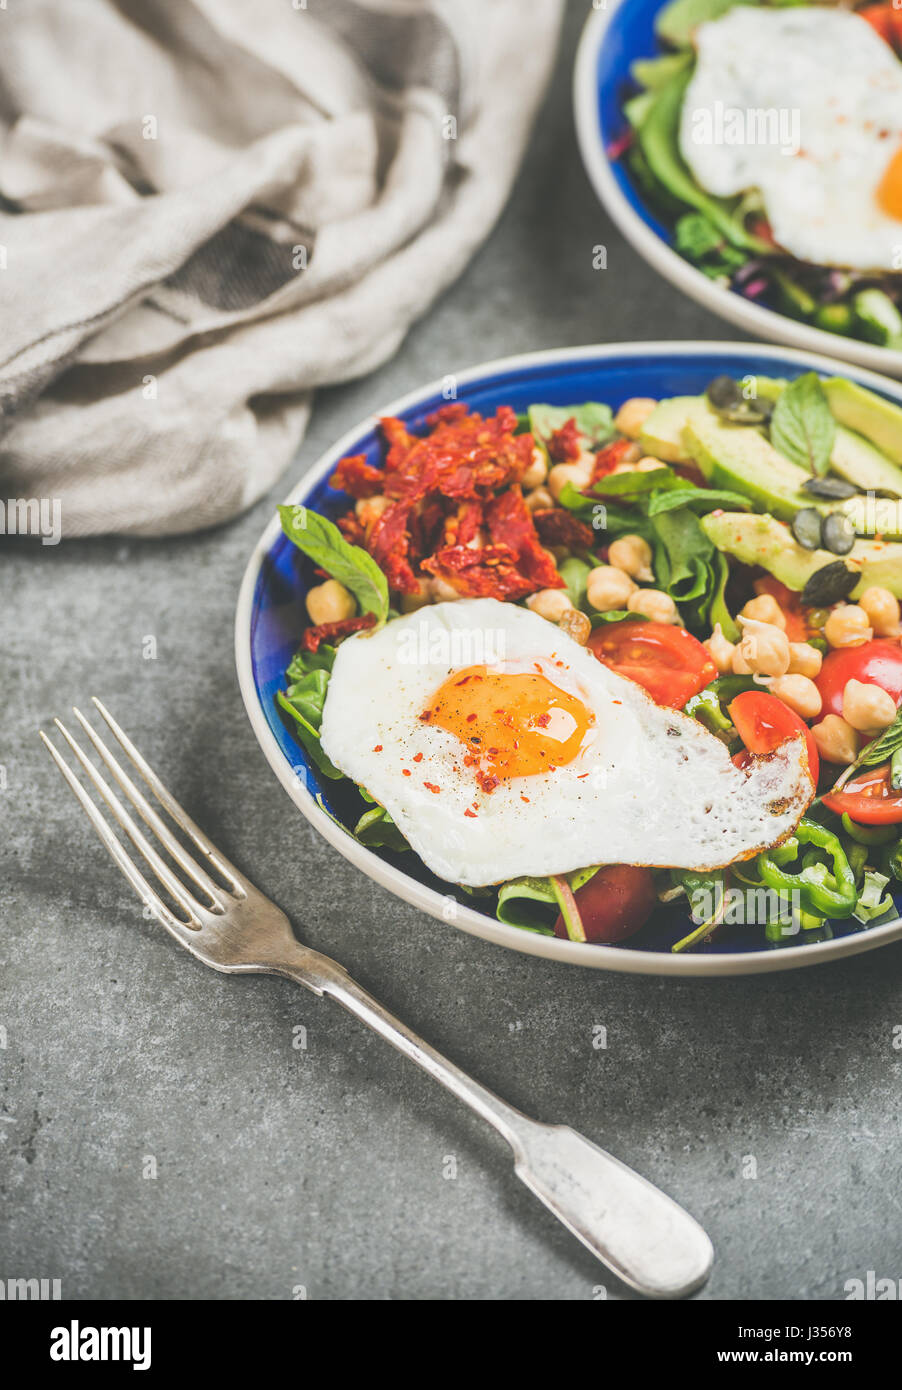 Concepto vegetariano desayuno con huevo frito, garbanzos, hortalizas, semillas Imagen De Stock